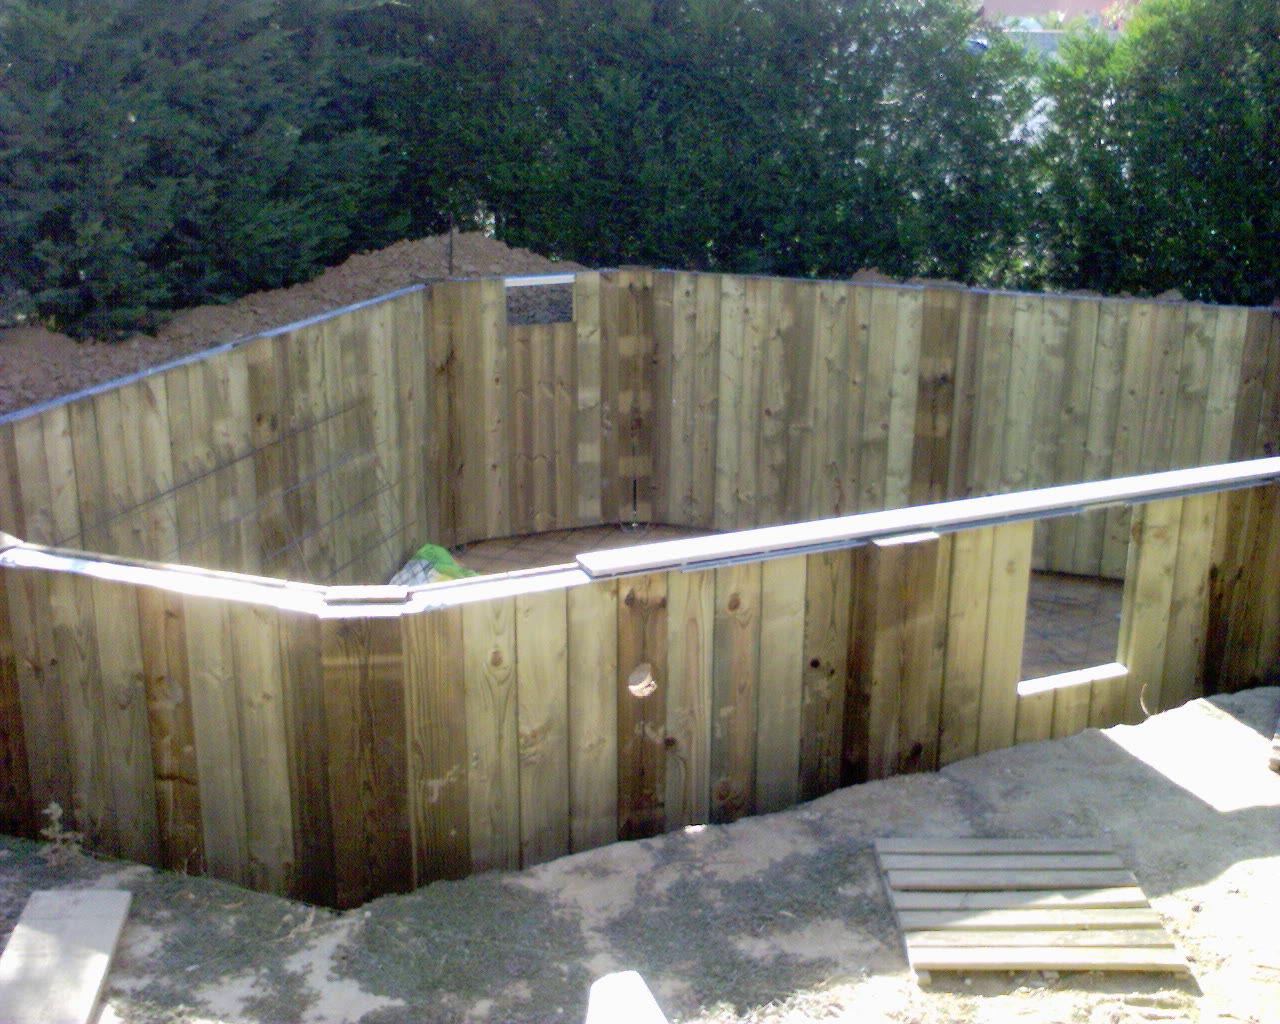 construire piscine en bois great piscine beton imitation bois aspect avis construire semi. Black Bedroom Furniture Sets. Home Design Ideas